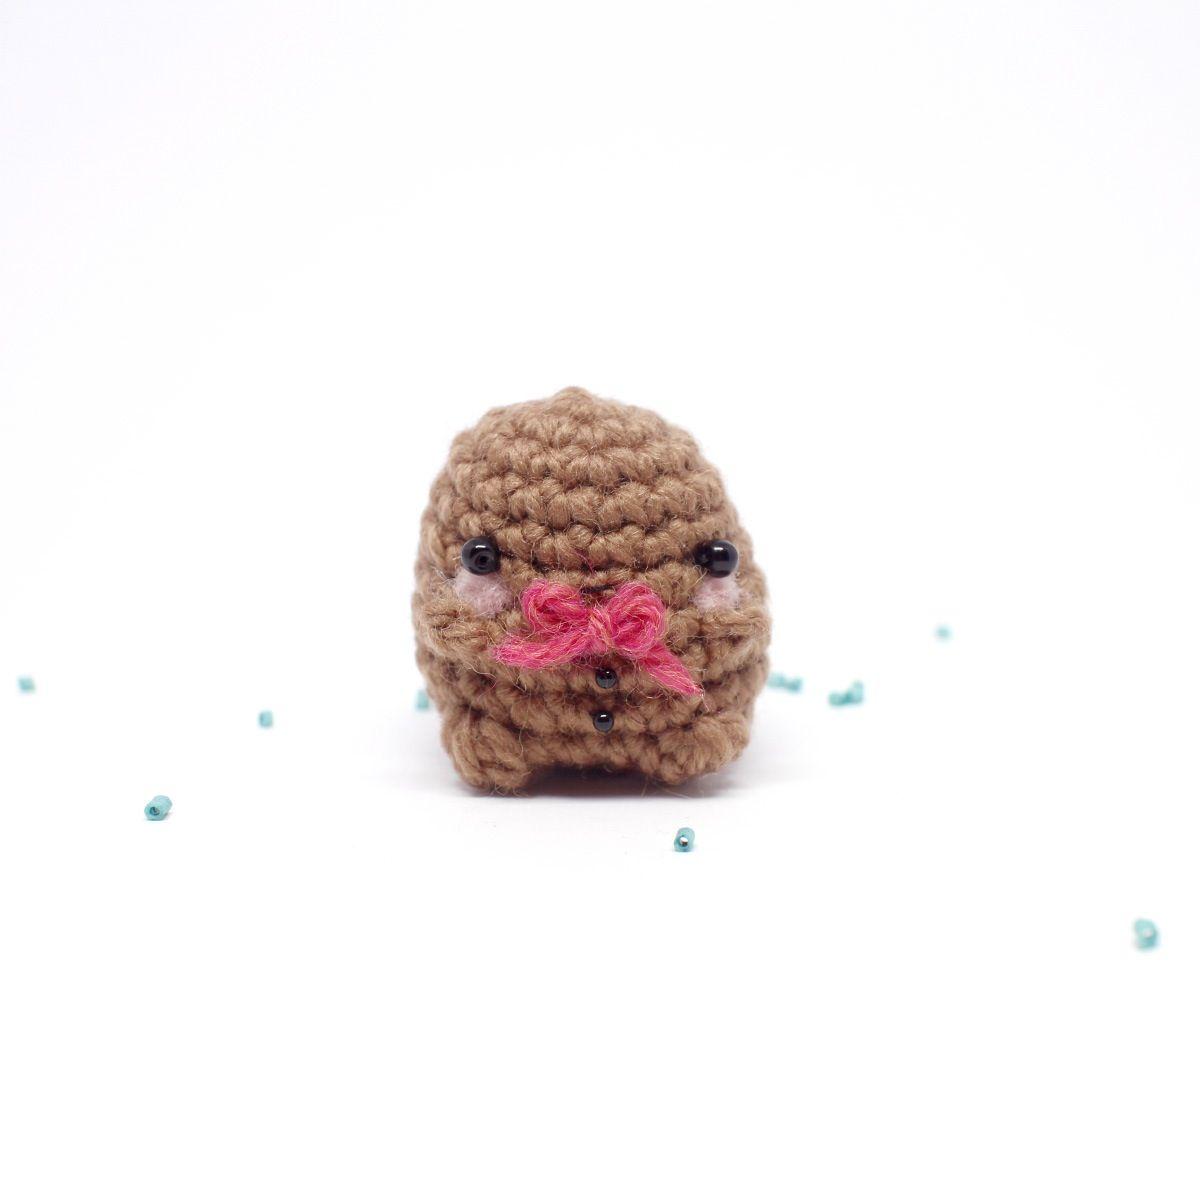 A mini gingerbread man amigurumi from mohu | Amigurumi | Pinterest